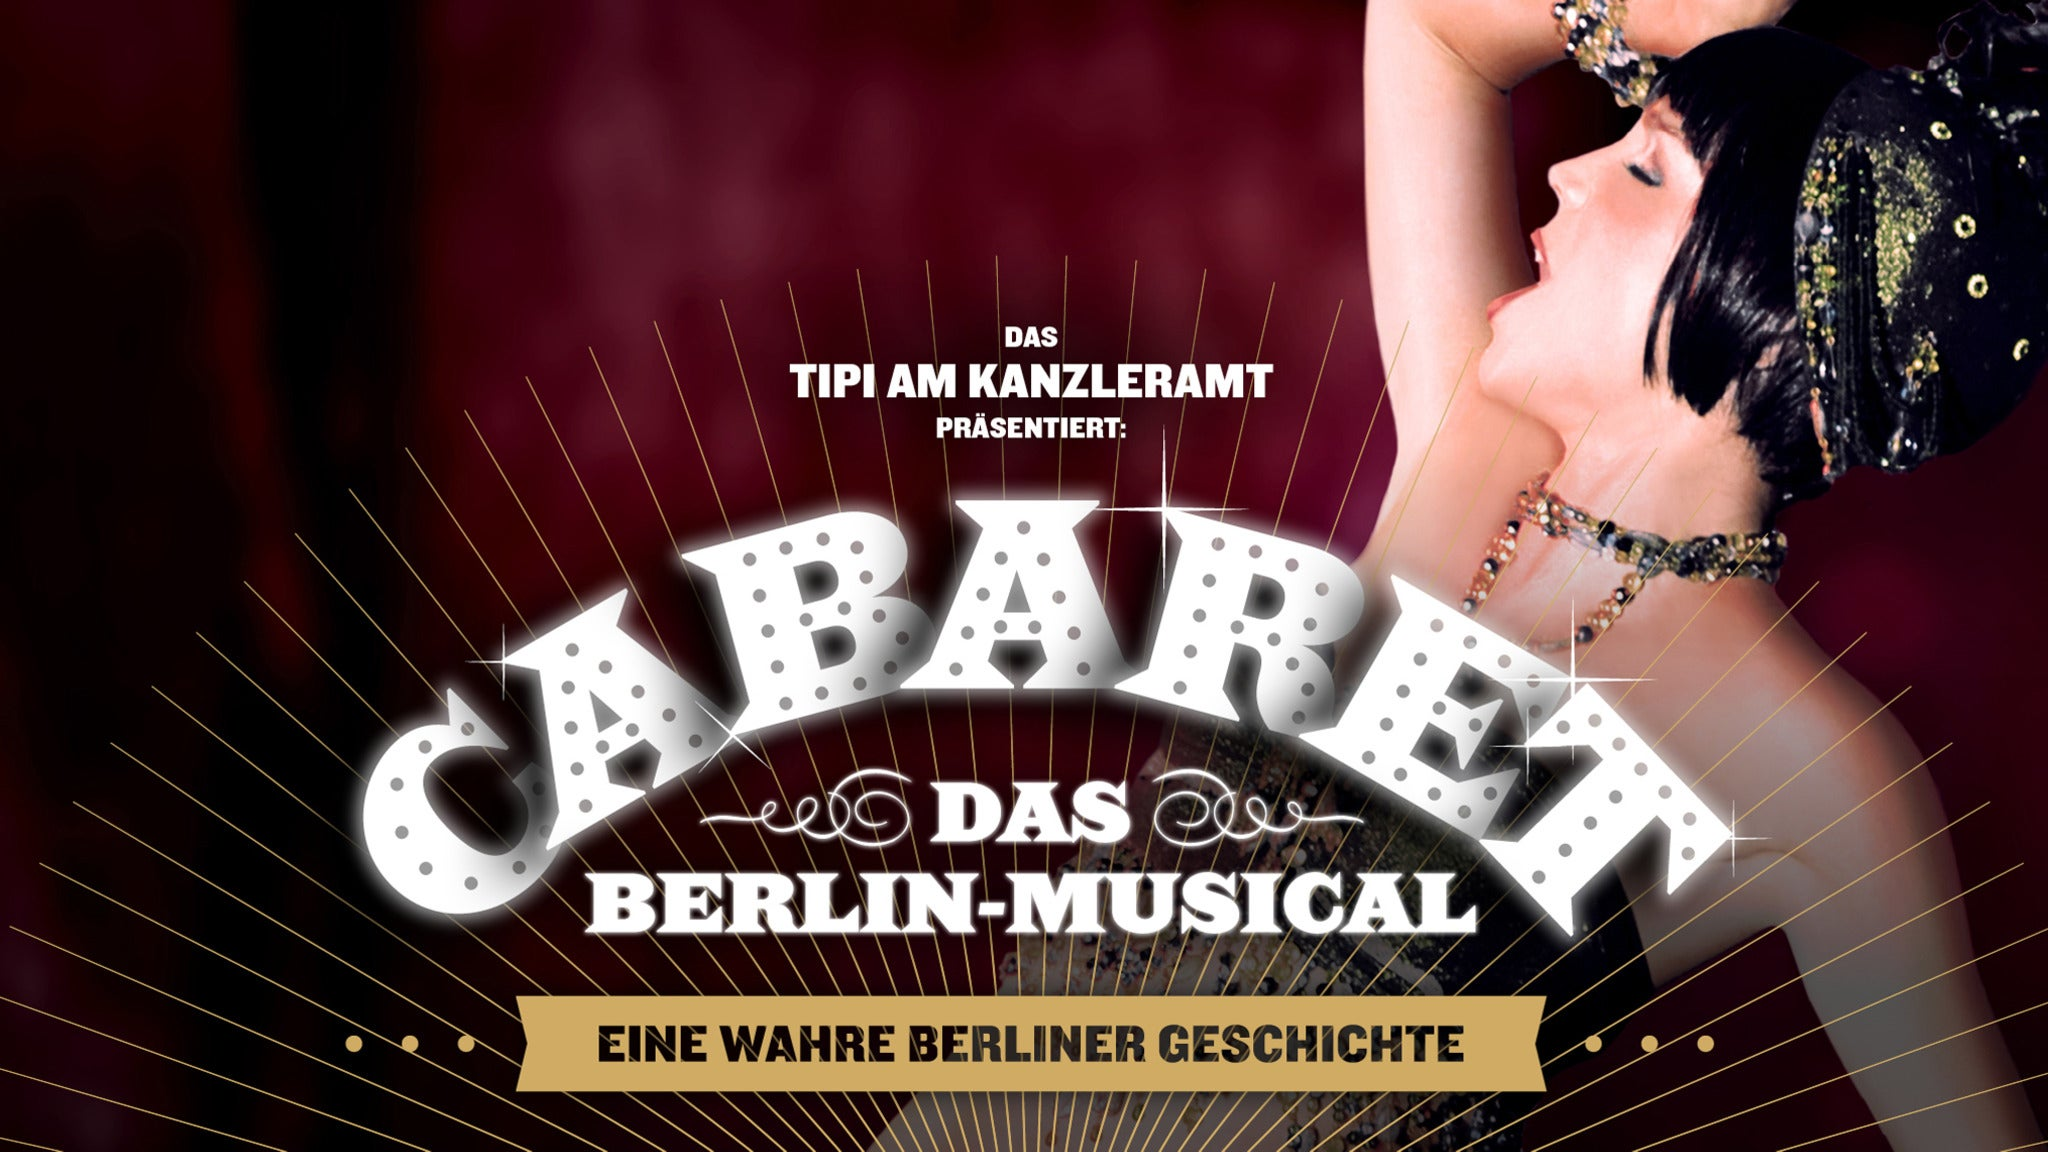 CABARET - The Berlin-Musical